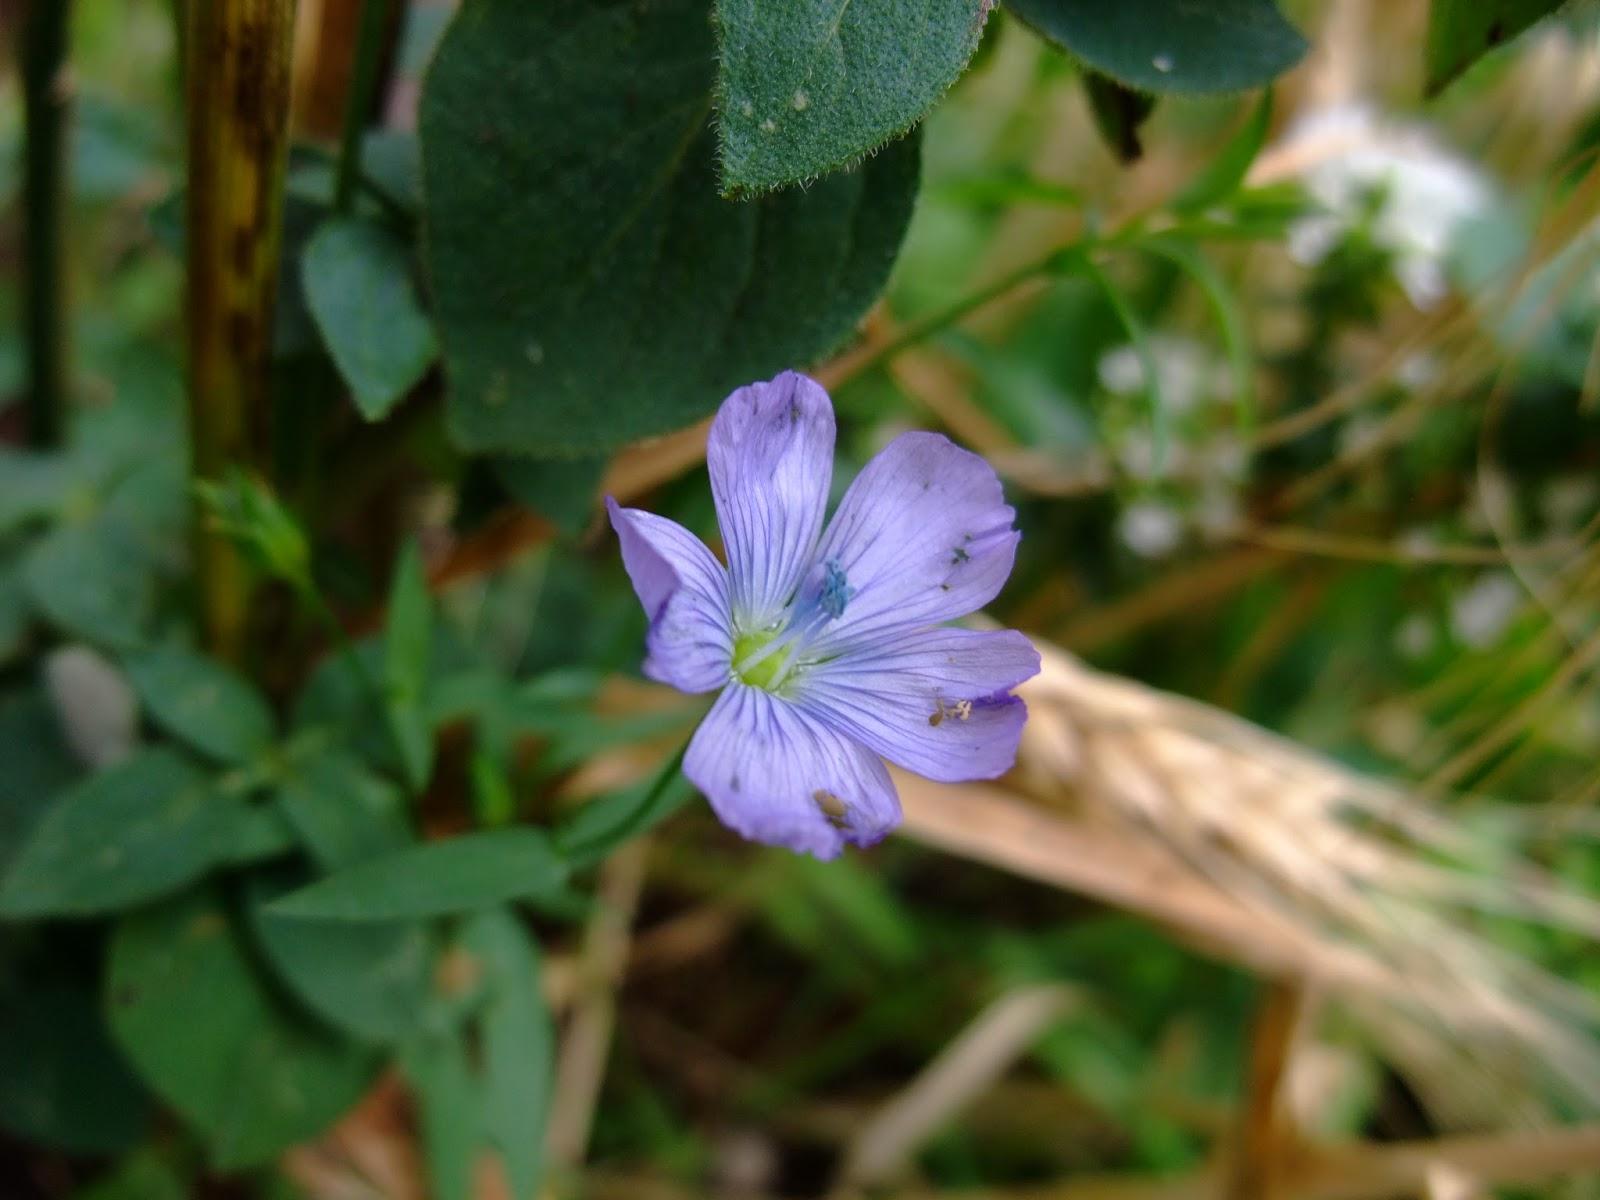 HERBAL PICNIC: LINSEED FLOWER / FLAX SEED